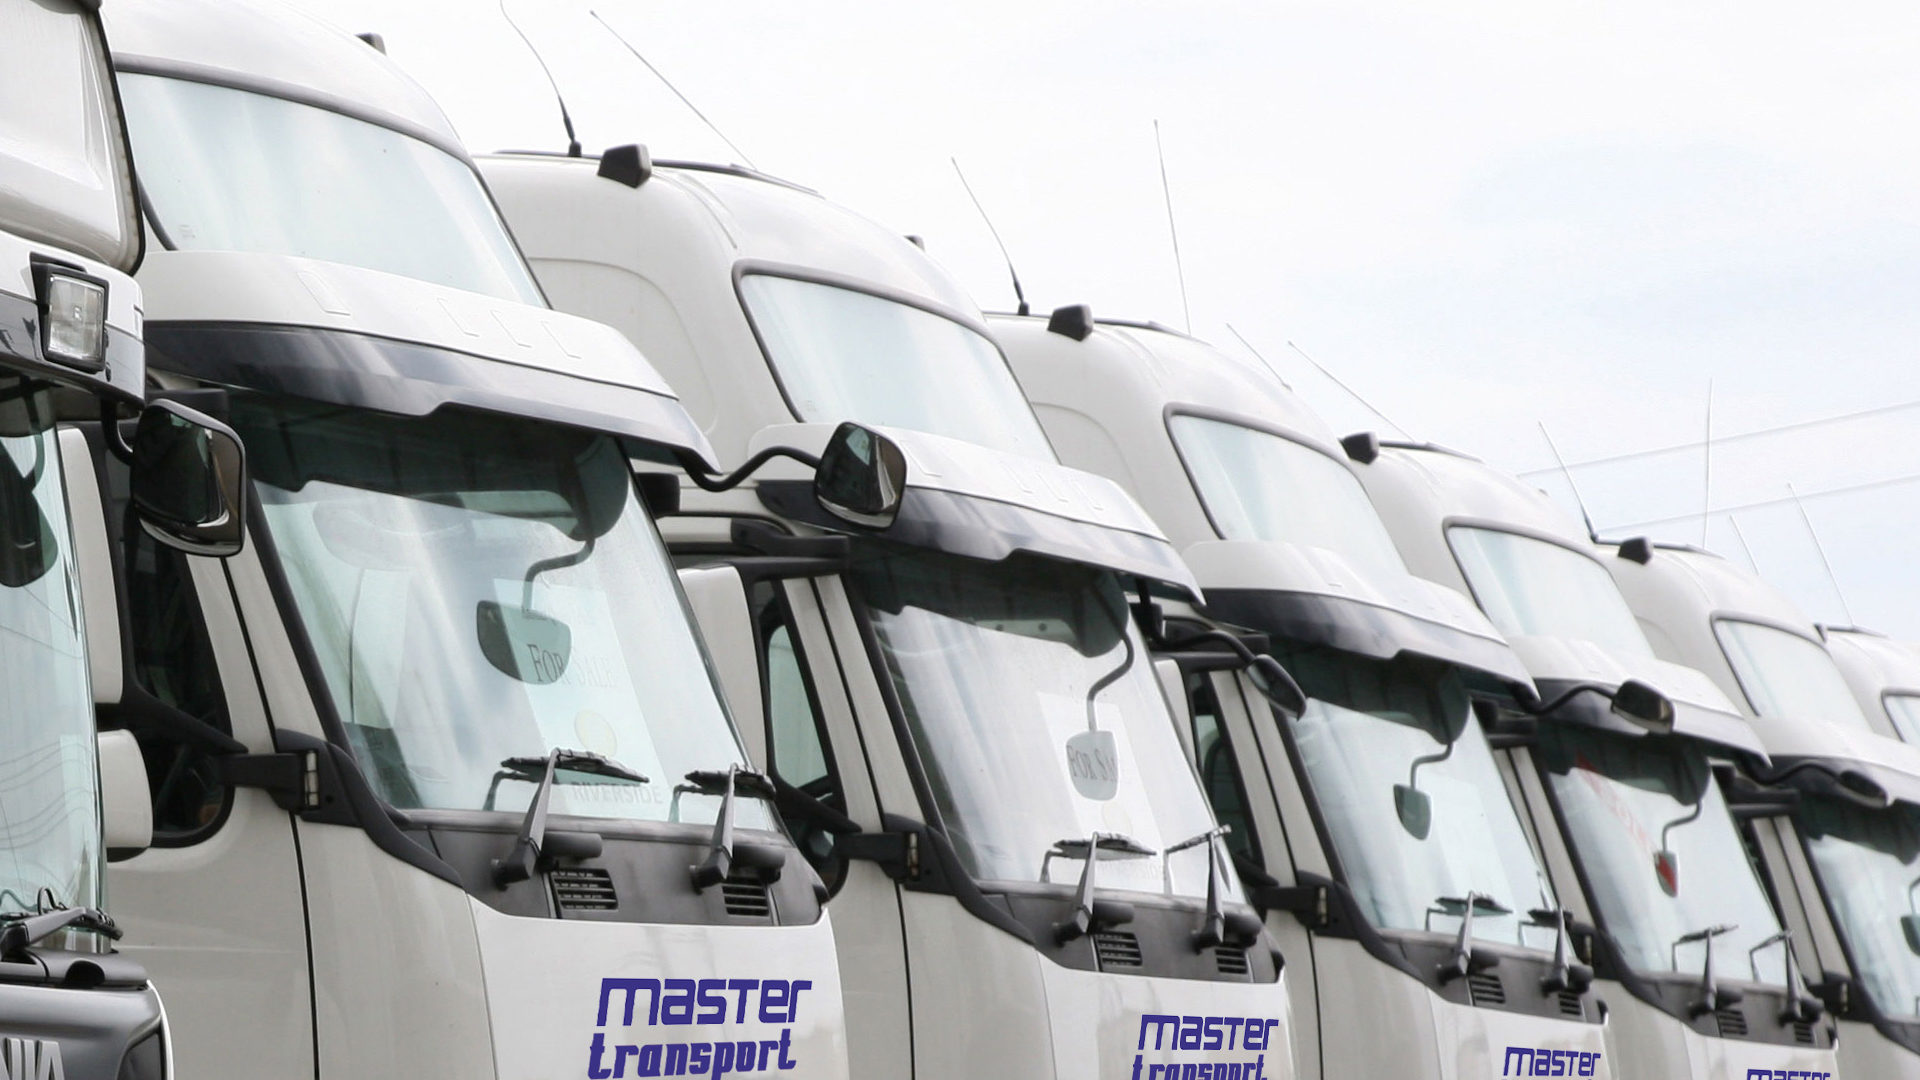 master-transport-medjunarodni-transport